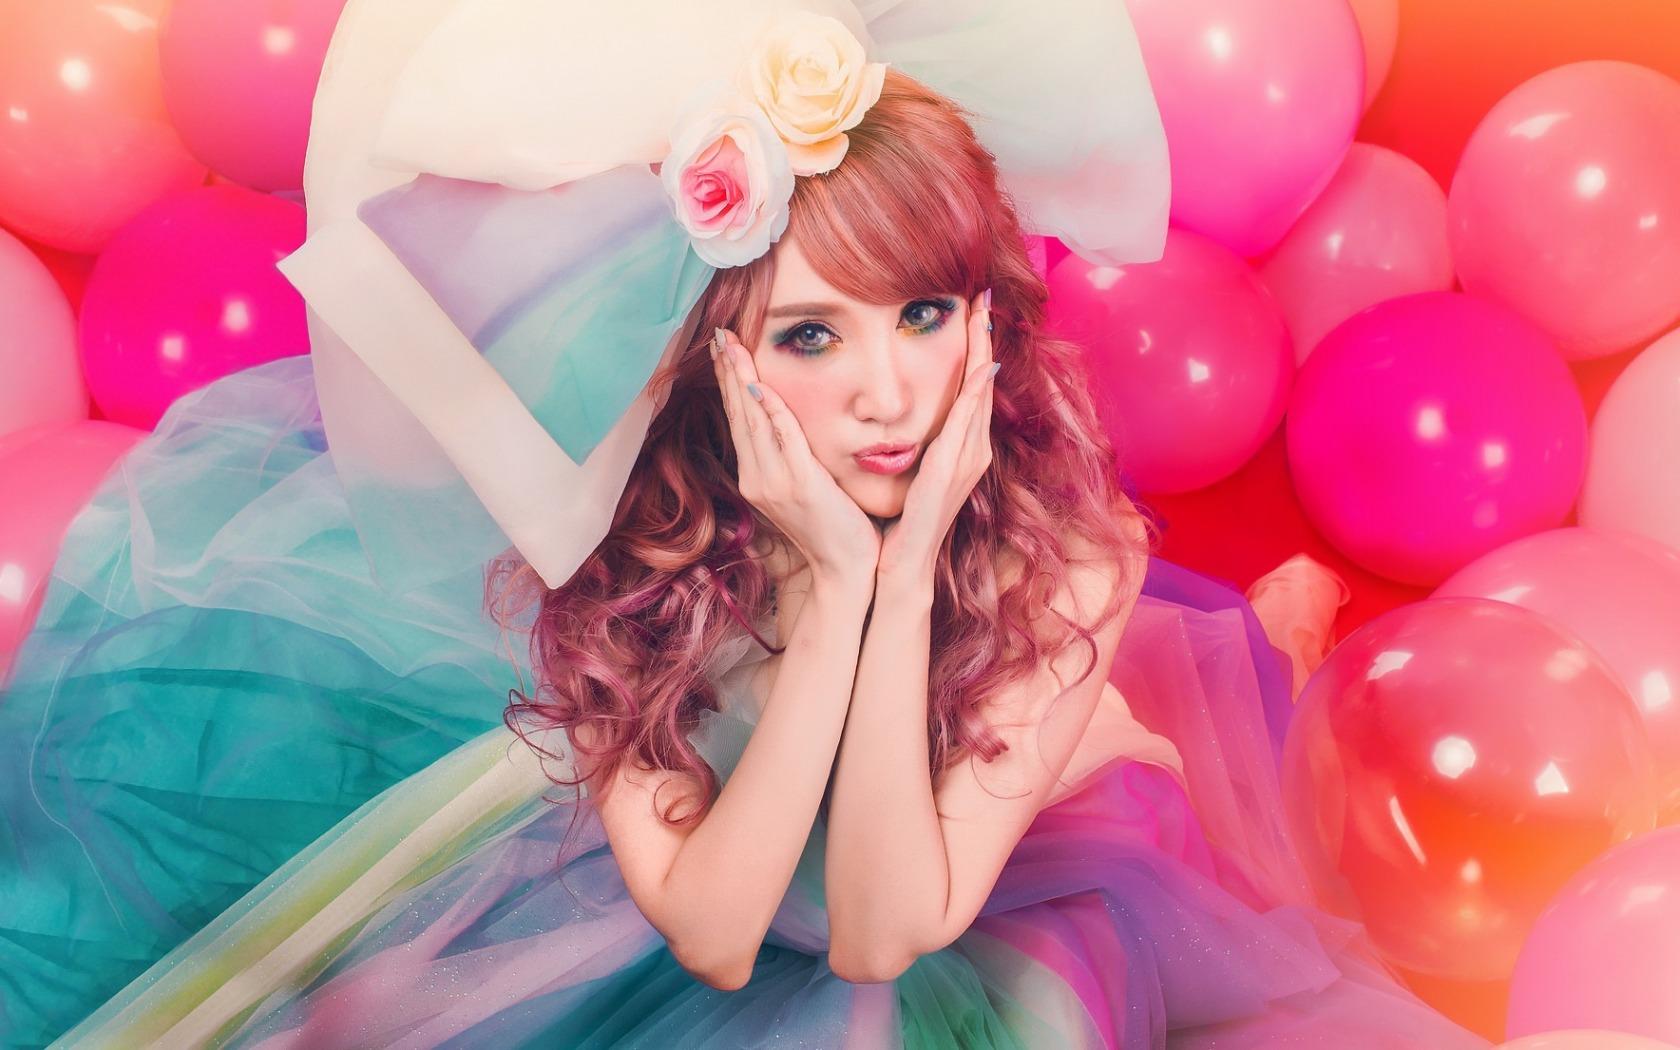 Картинка девочка с шариками в волосах